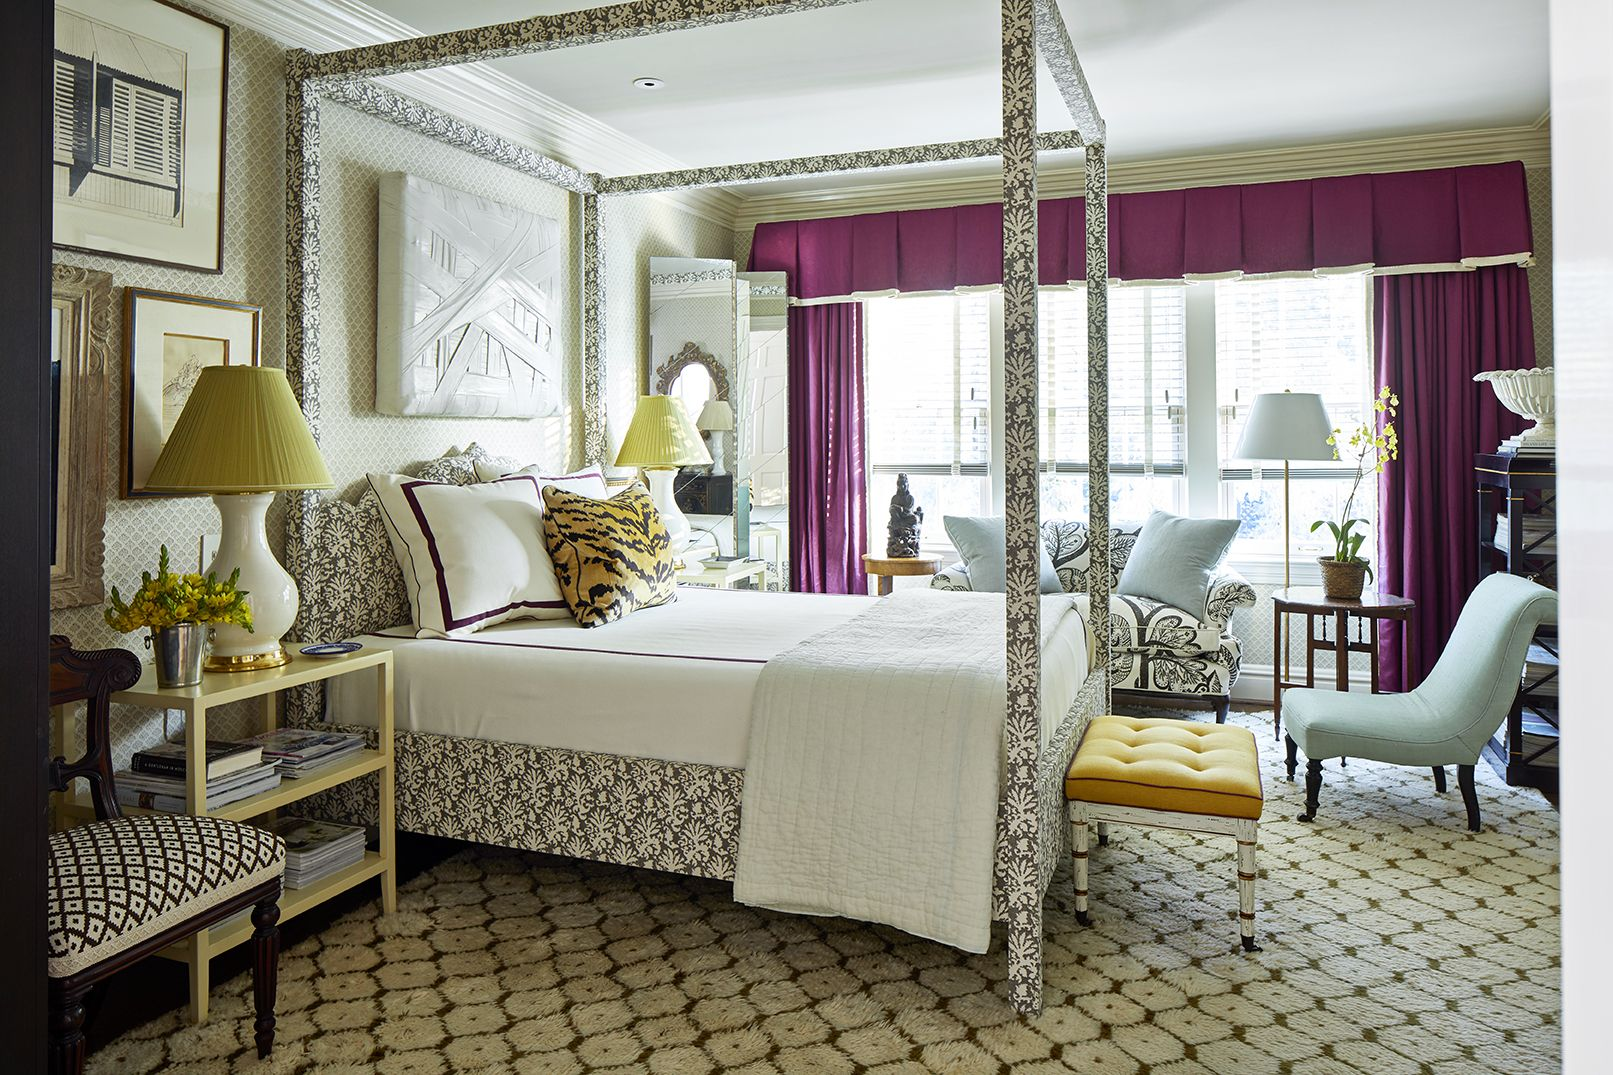 14 Best Master Bedroom Ideas - Beautiful Large Master ... on Best Master Bedroom  id=76565